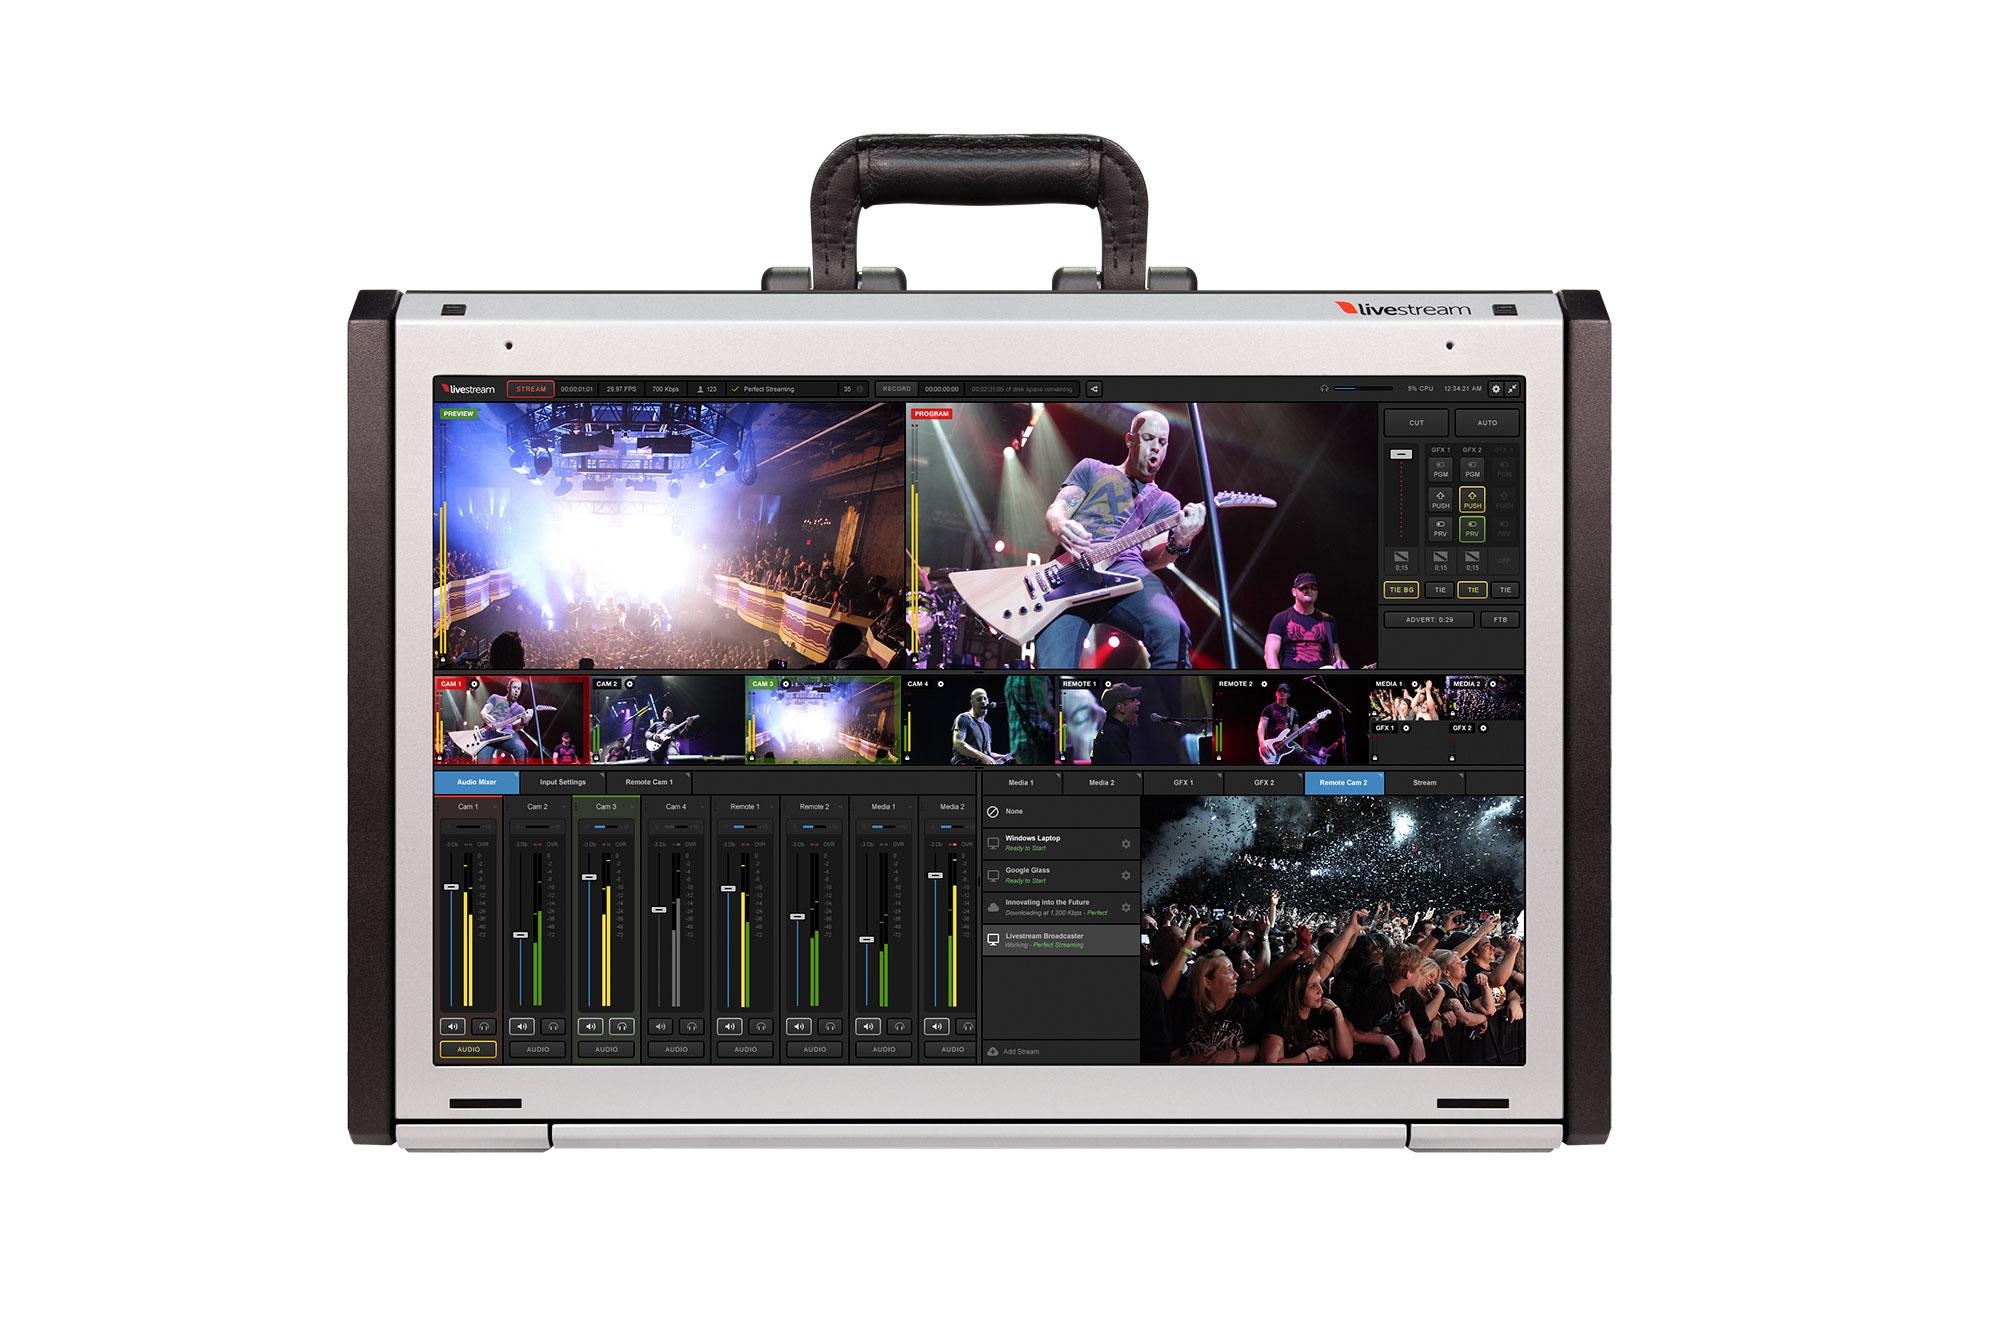 HD500-front-88dba1b7a0bfd06accc9882c2985e17a.jpg